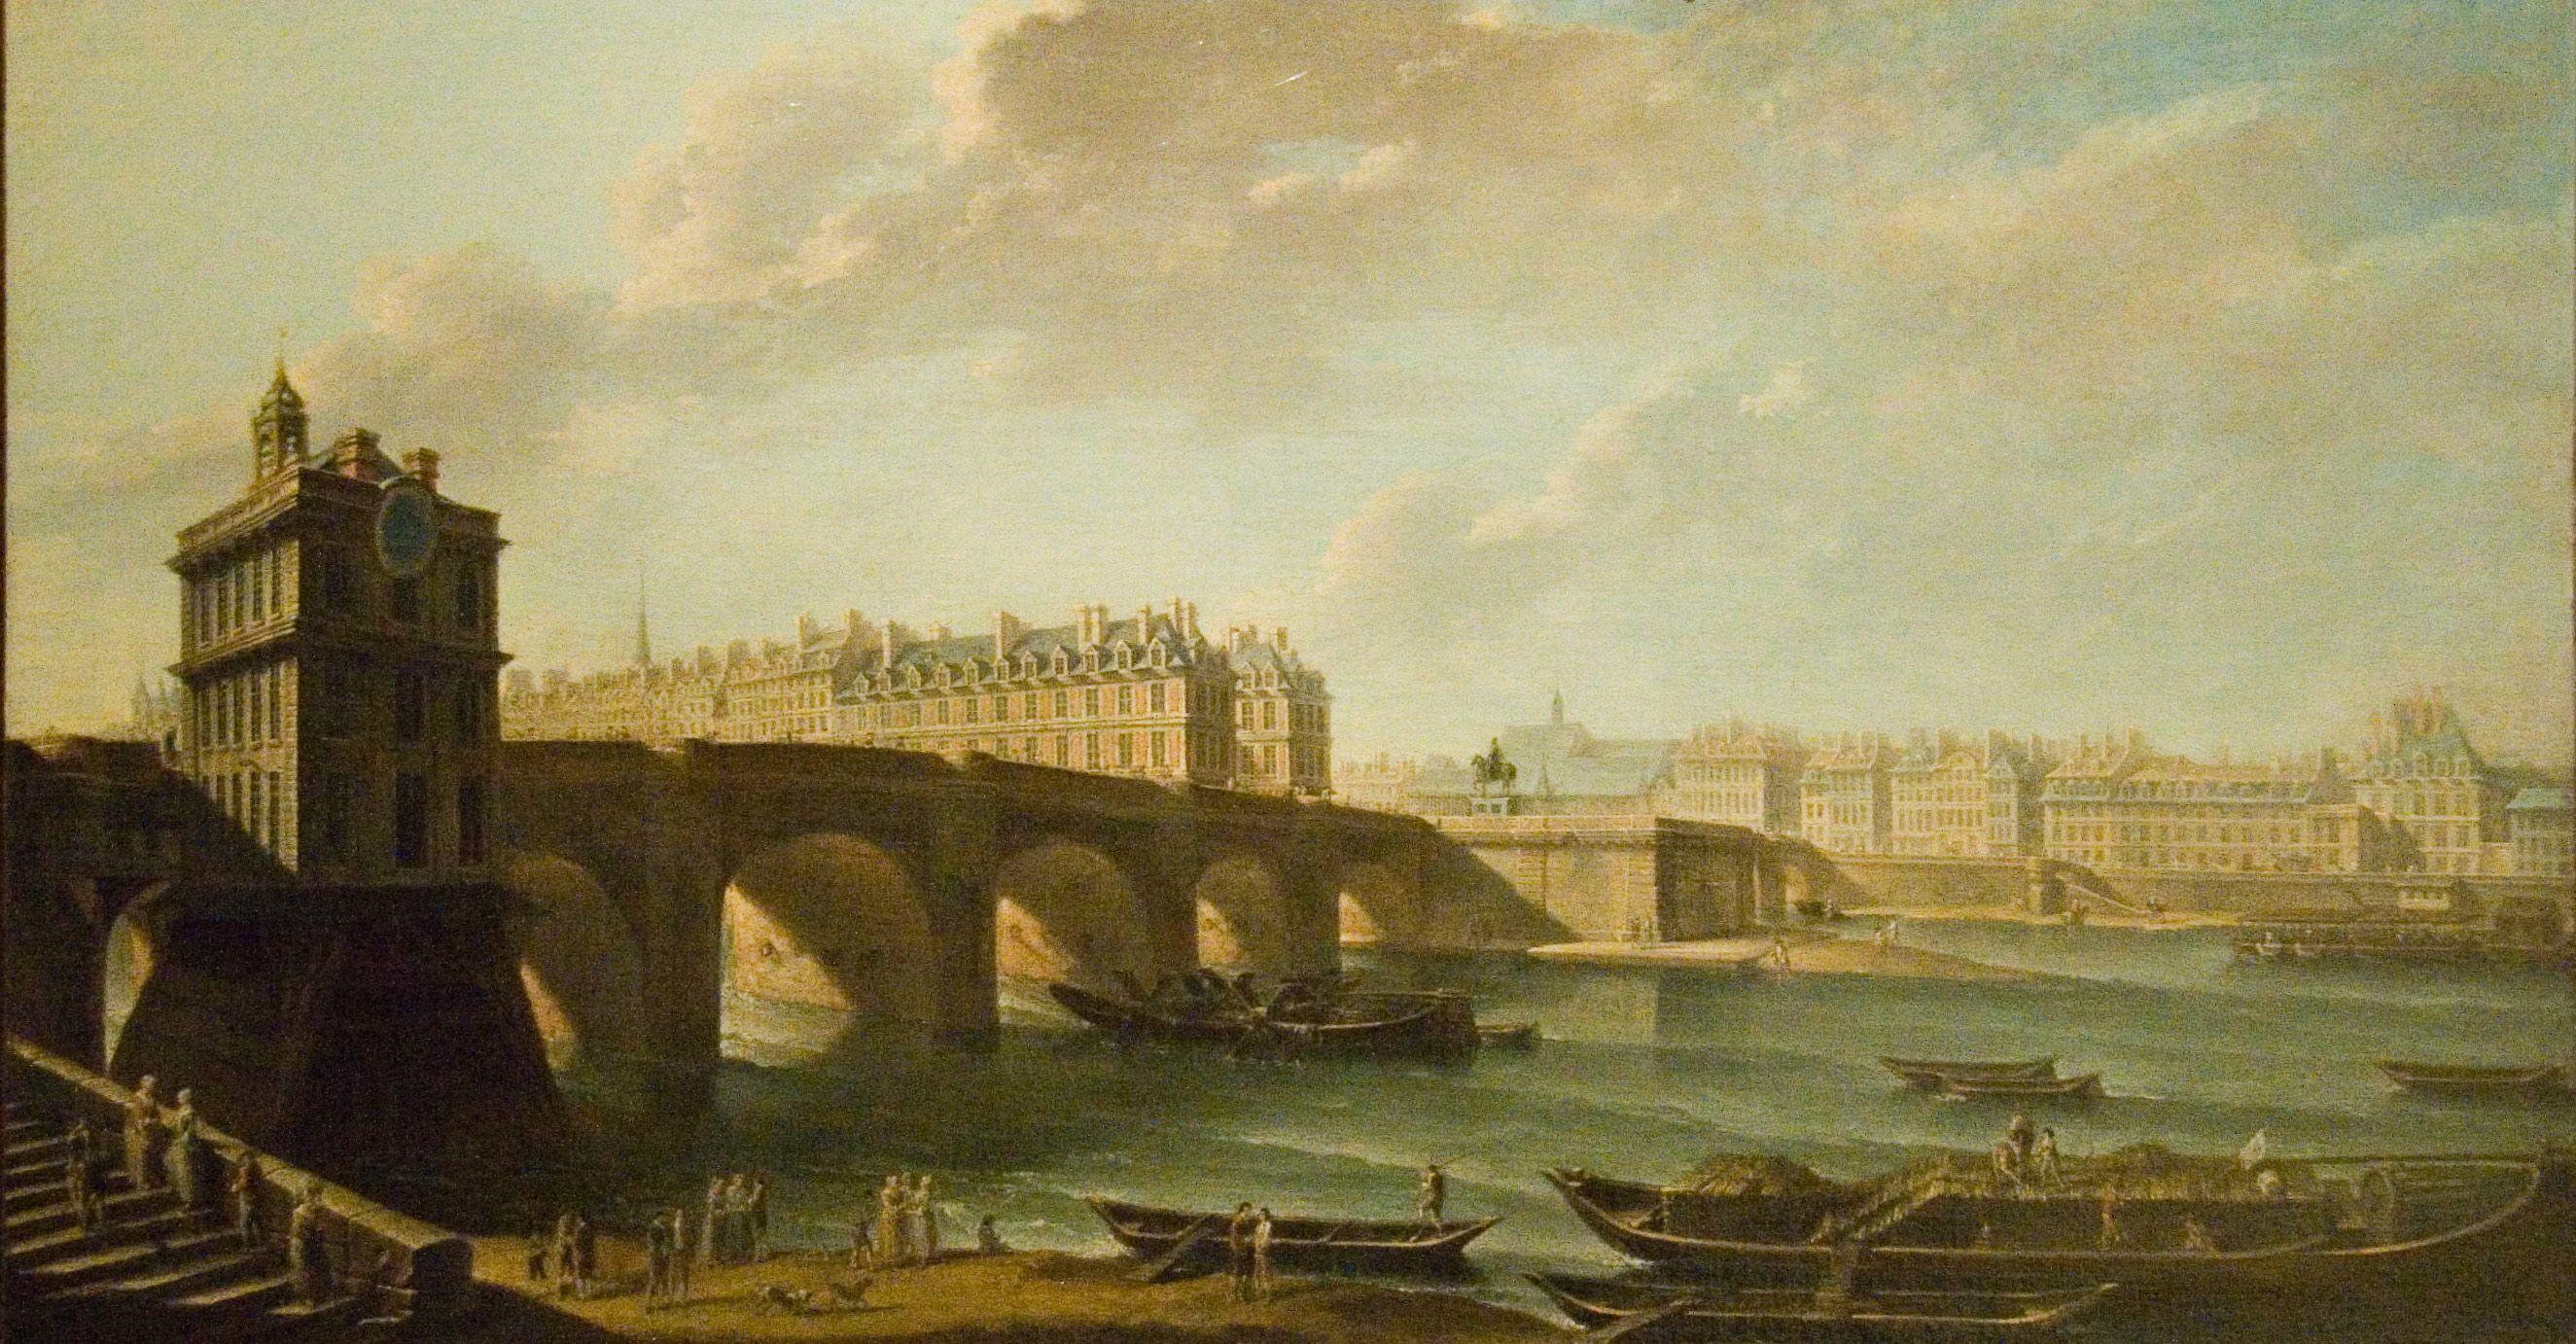 th century paris raguenet pont neuf samaritaine th century 18th century paris raguenet pont neuf samaritaine